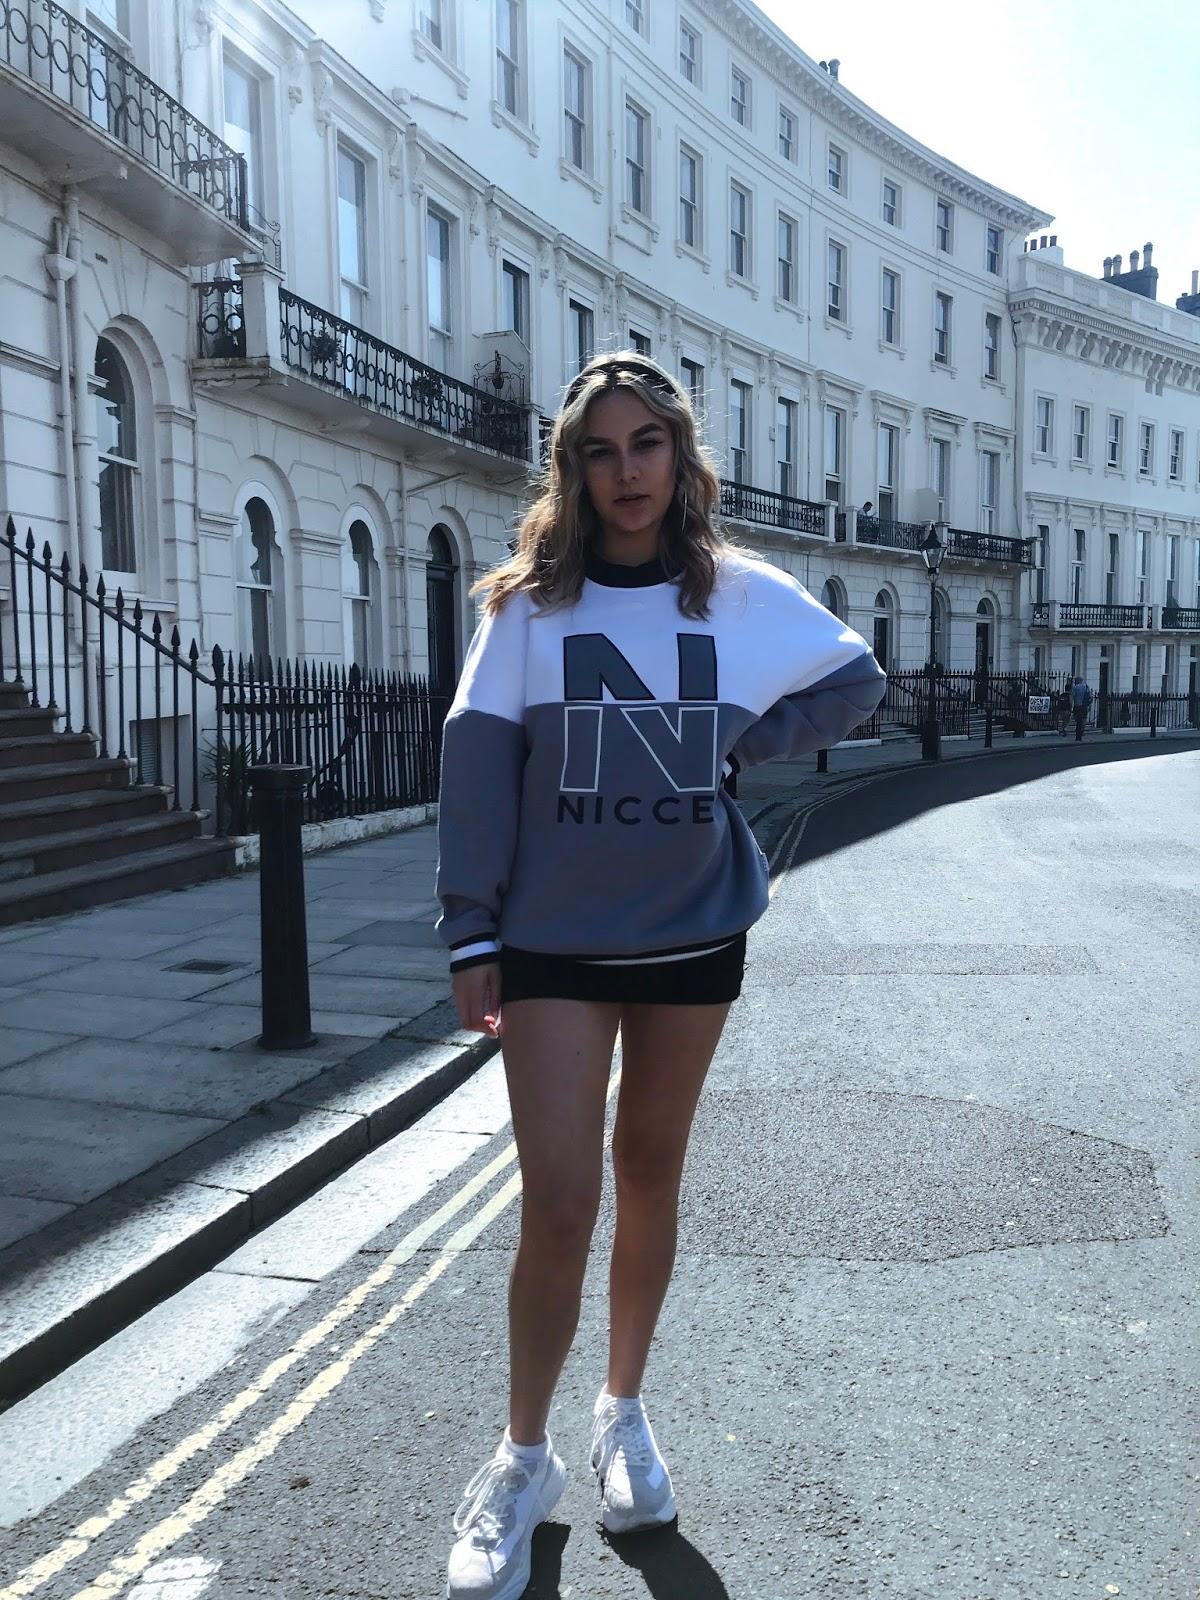 yasminstefanie nicce sweatshirt chunky ciara topshop trainers